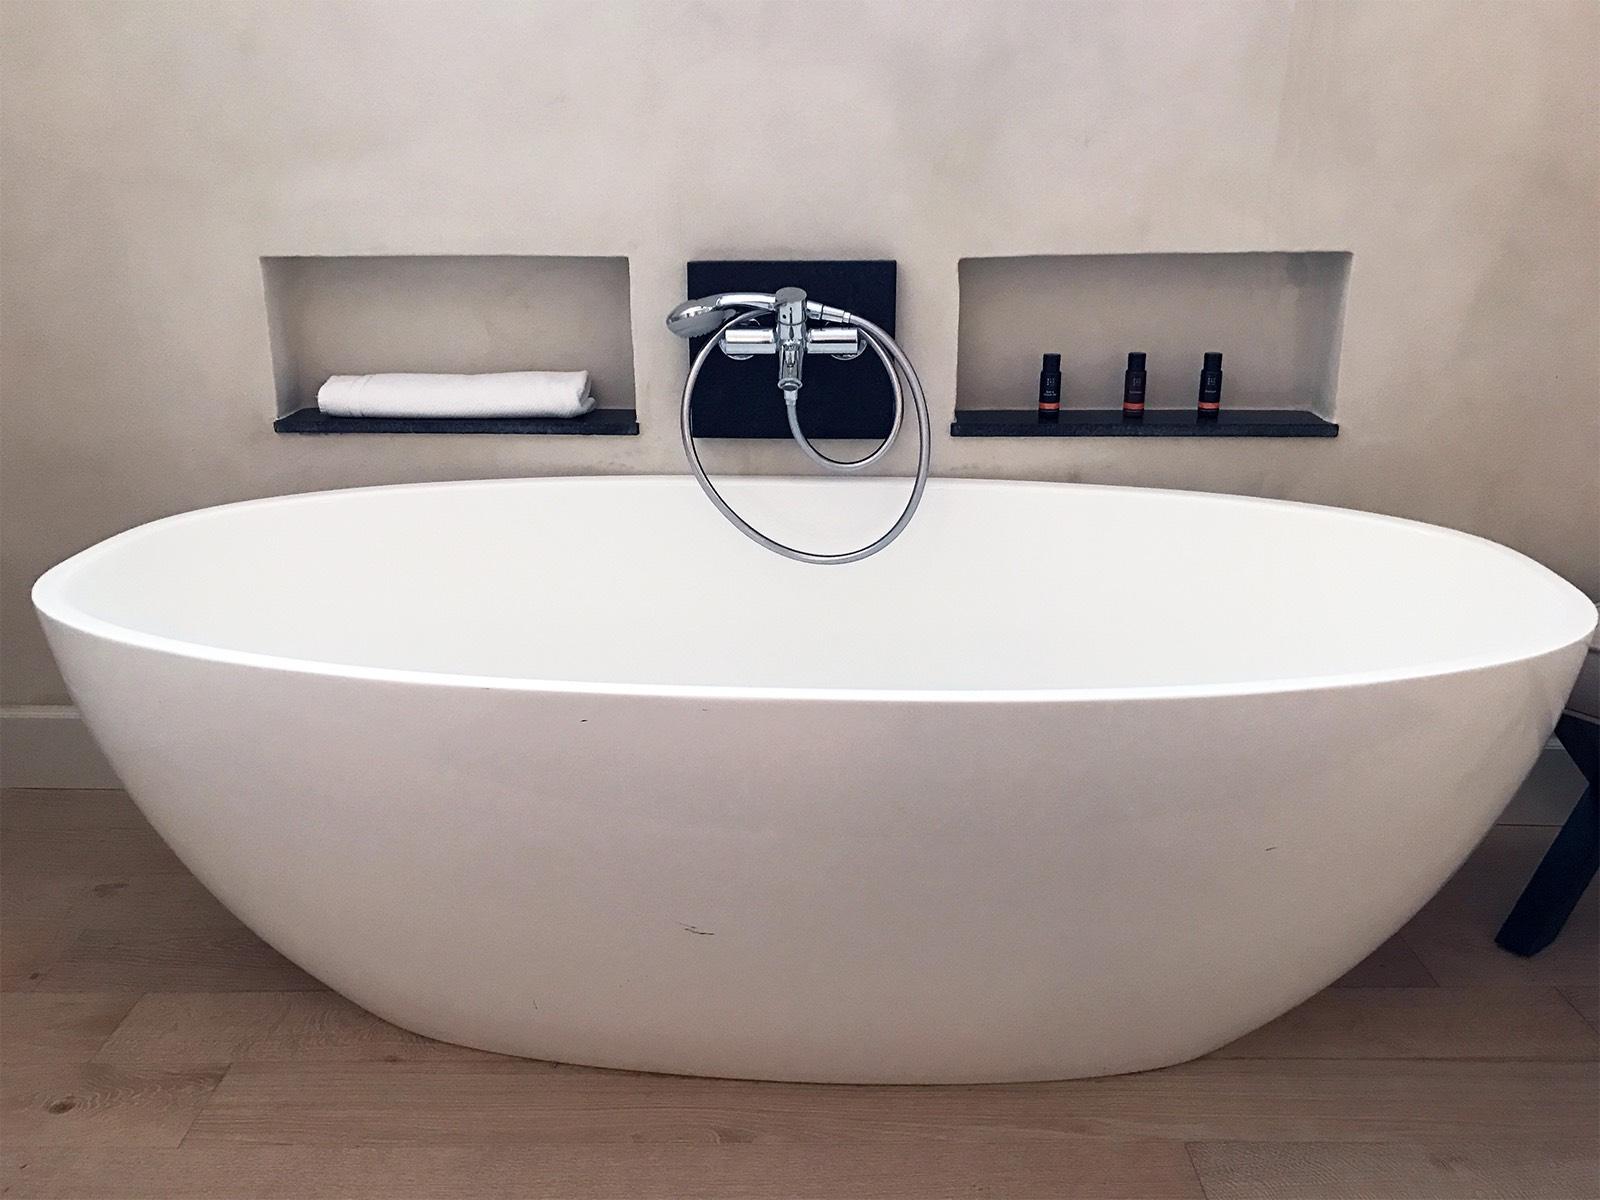 Corral del Rey hotel Seville Spain bathtub.jpg